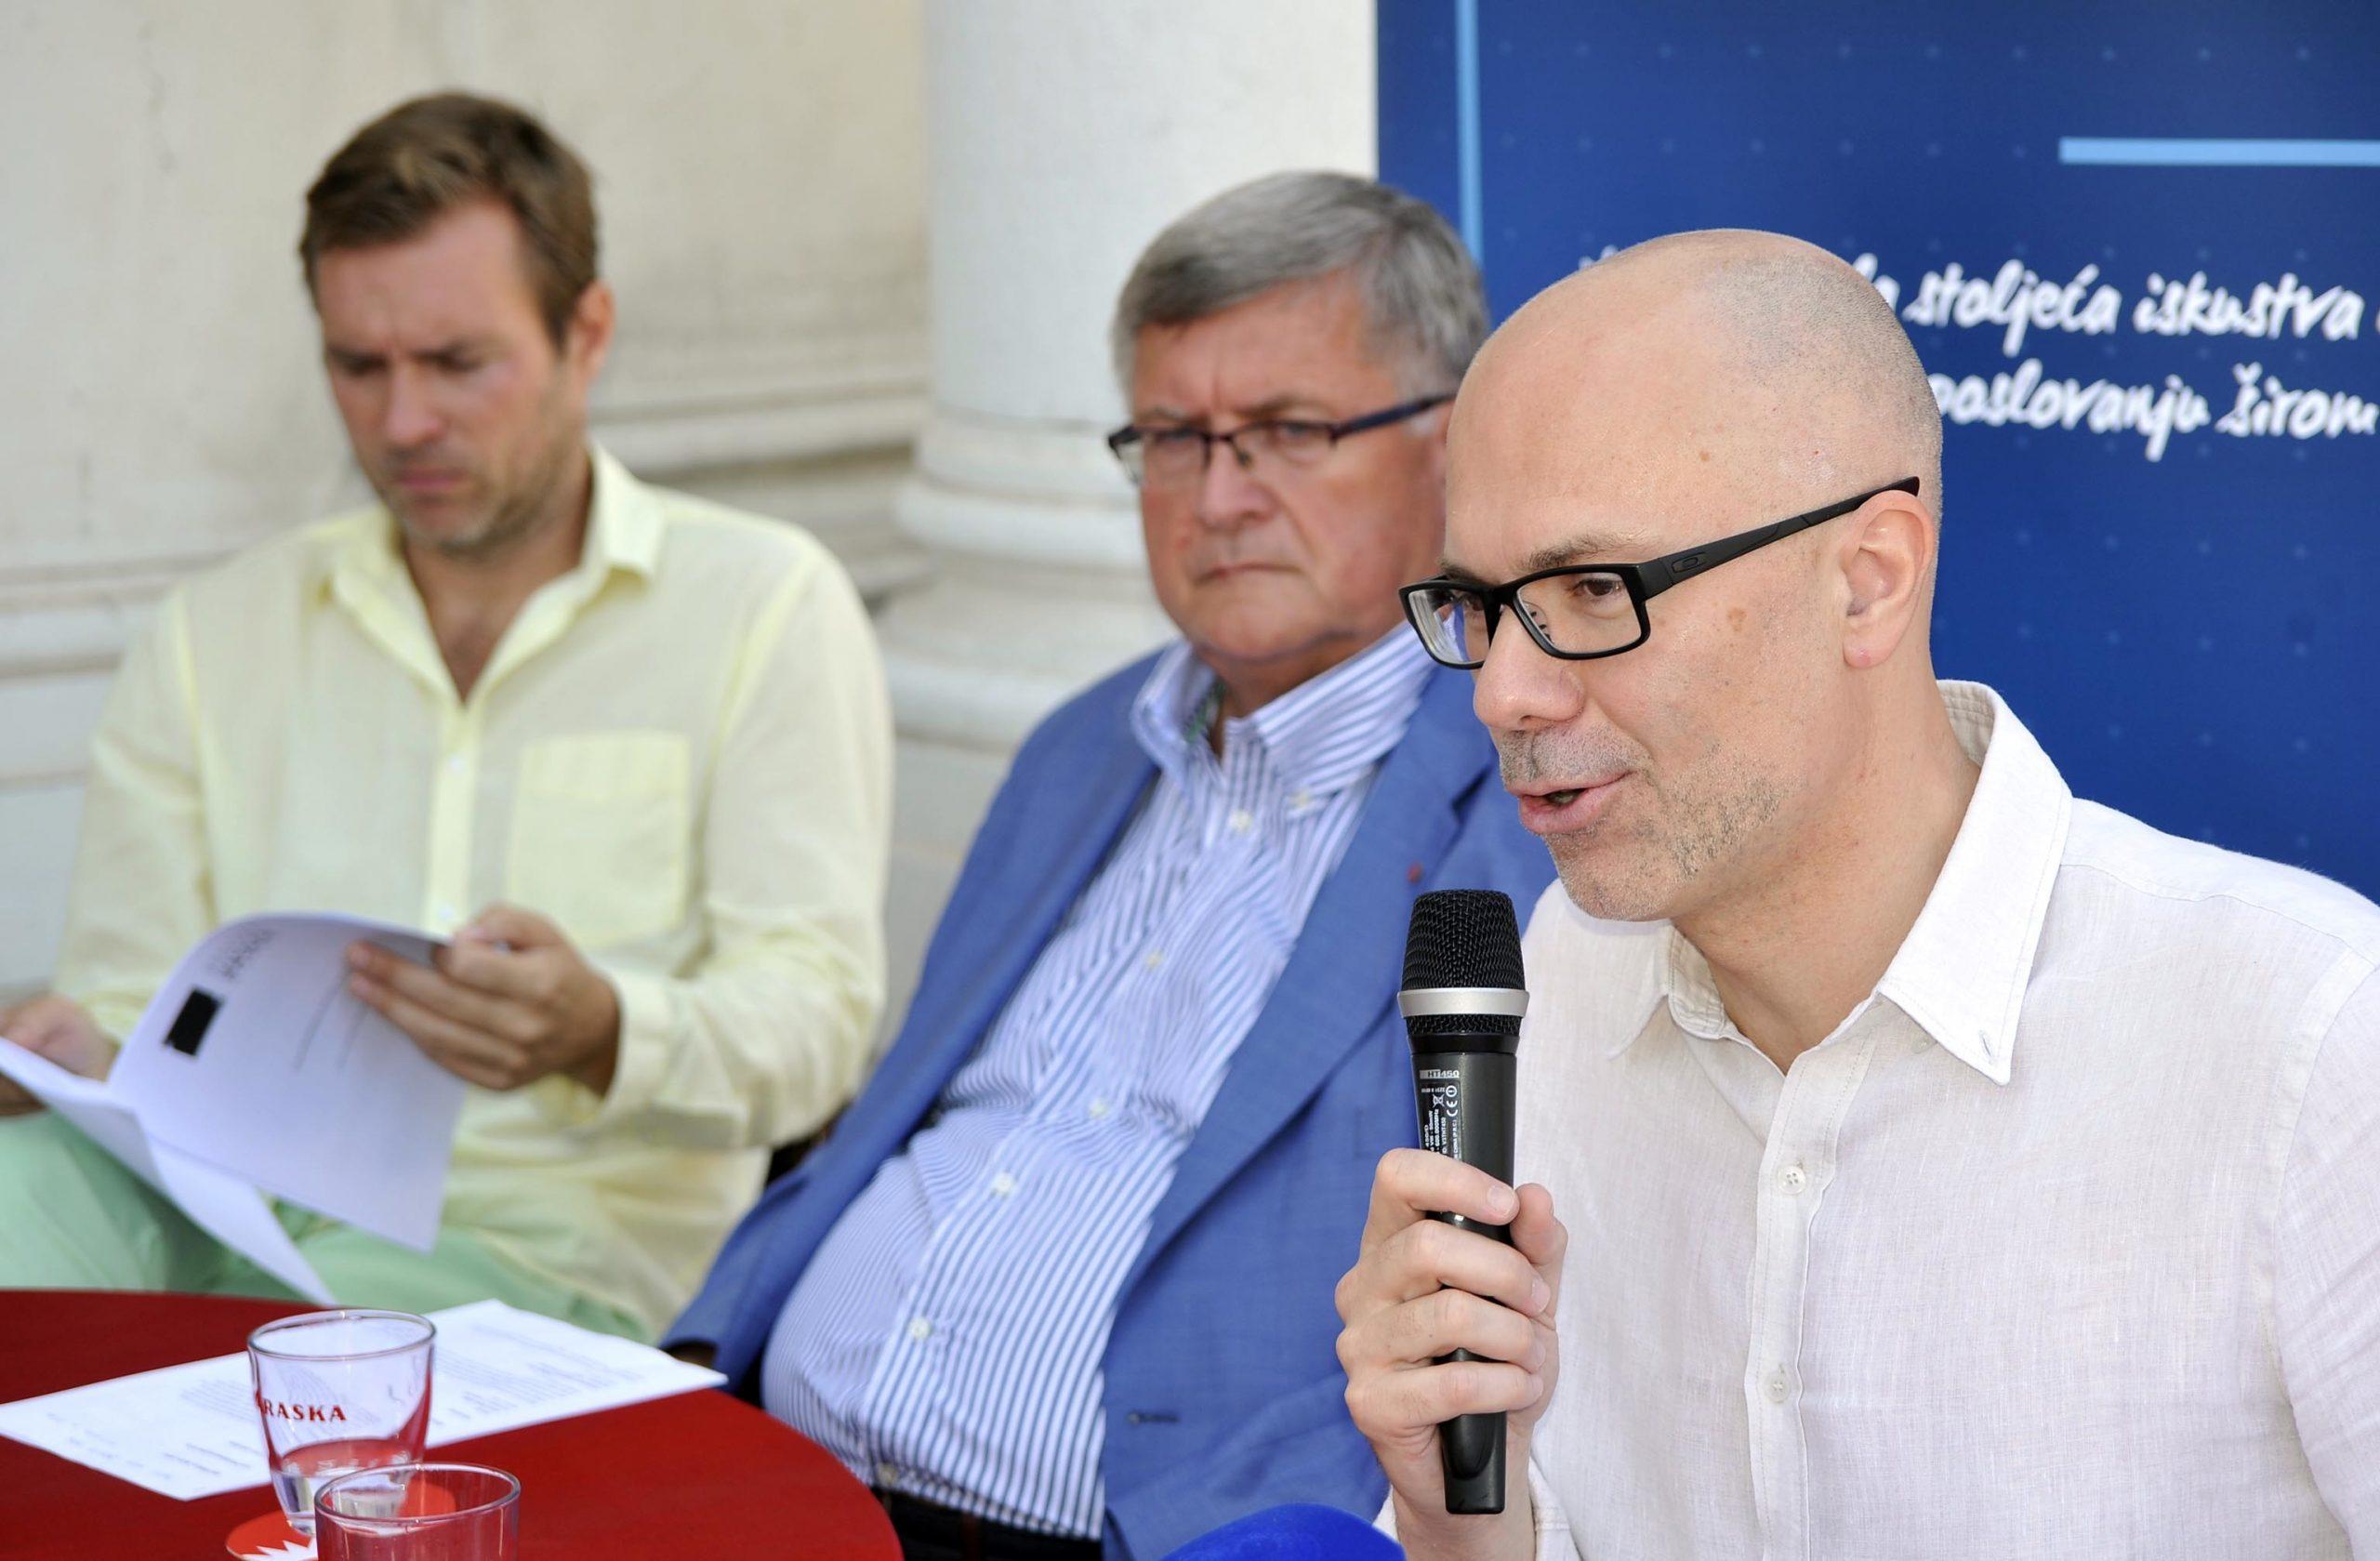 Marin Blažević govori, Obersnel i Šarar šute / Foto: D. ŠKOMRLJ